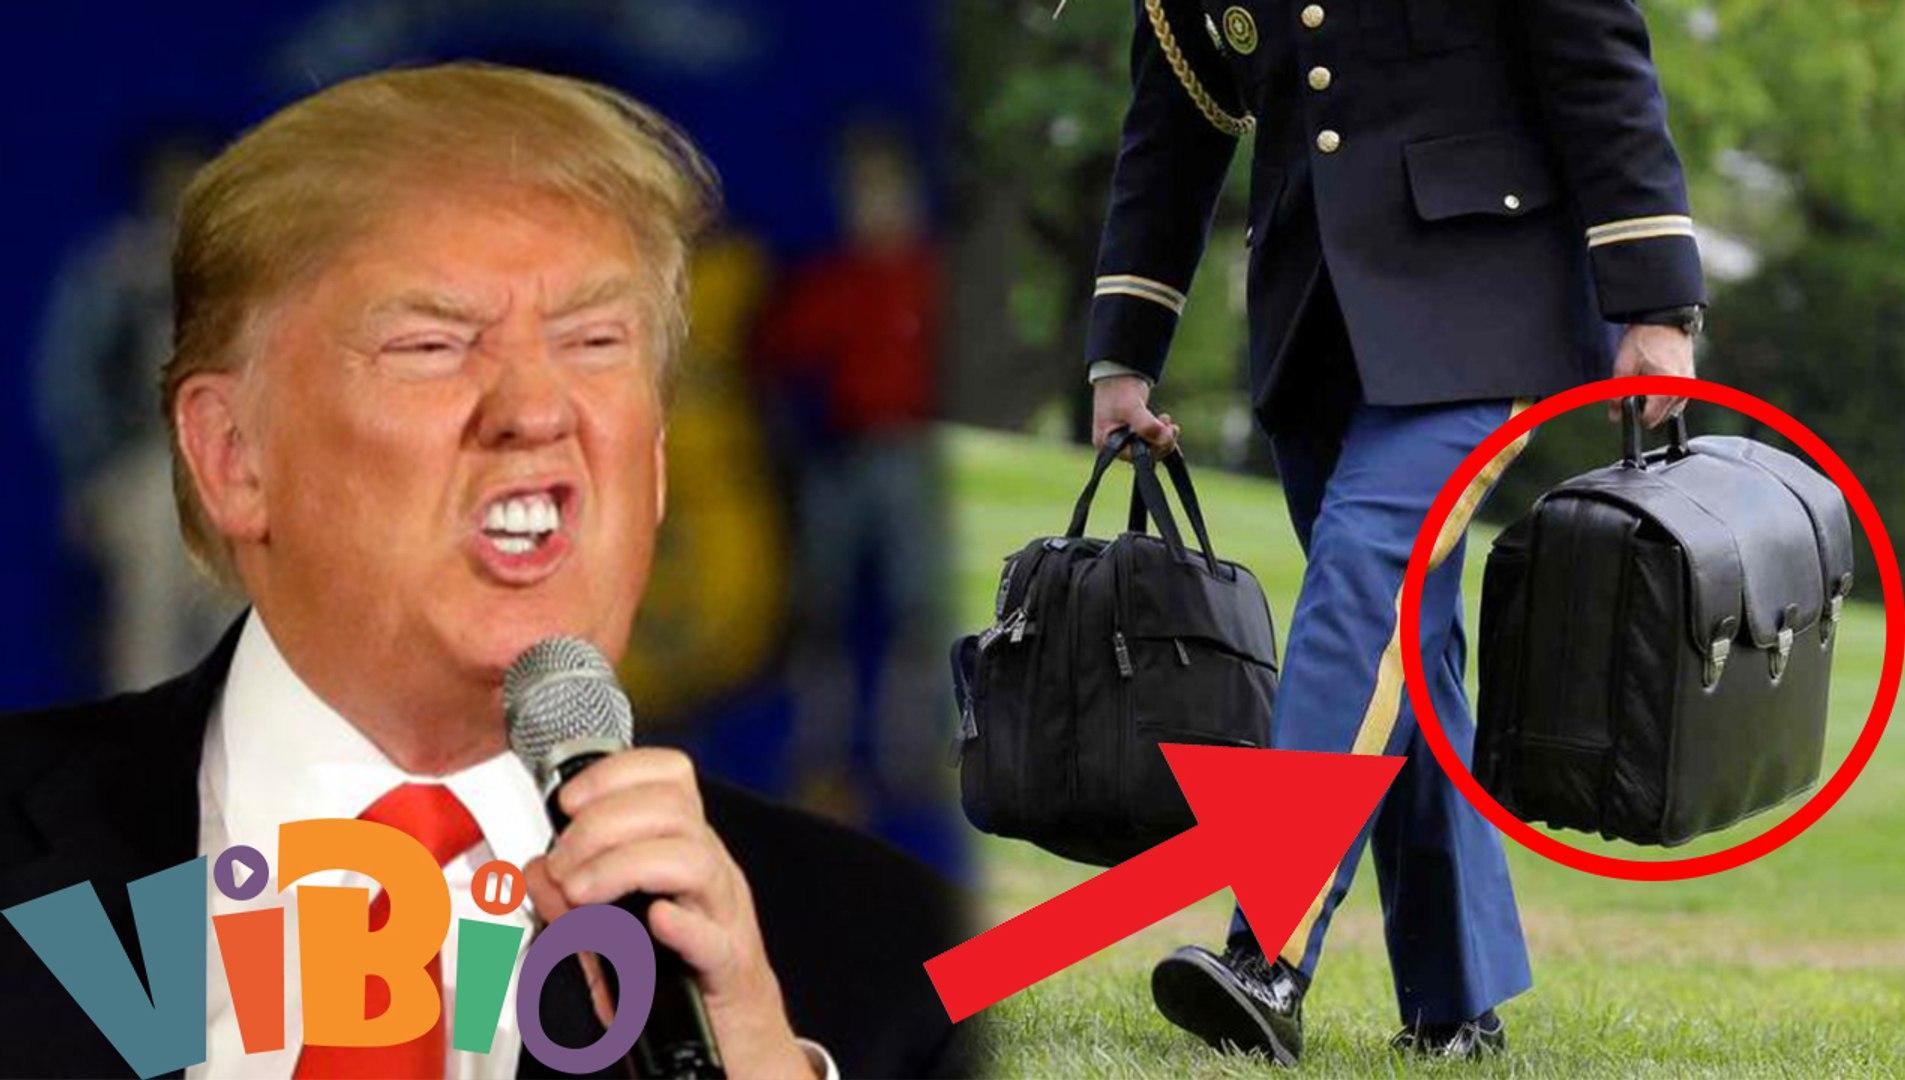 Donald Trump Aslında Kim?